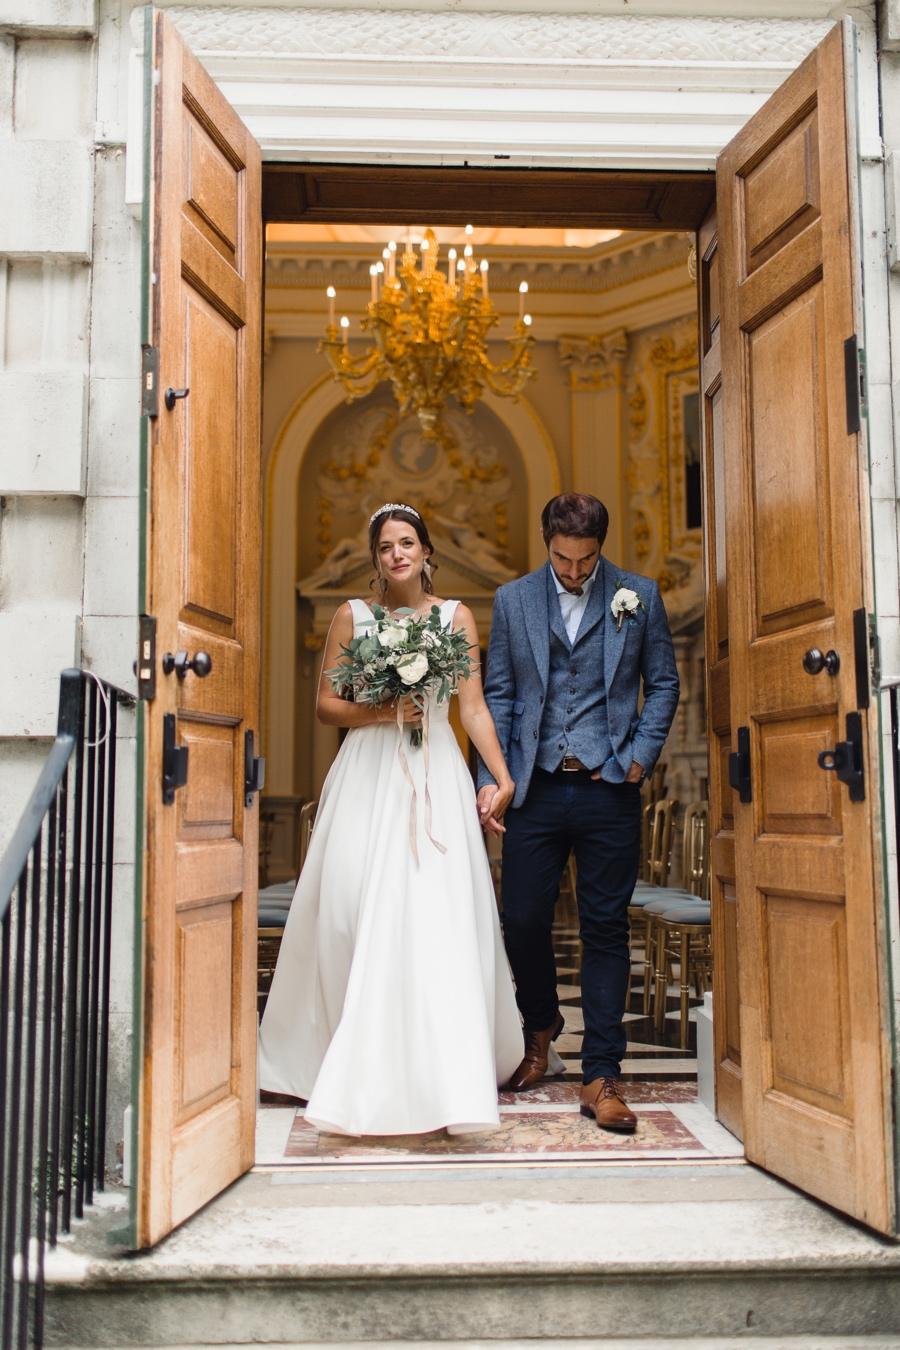 Intimate summer wedding at Orleans House, Twickenham, London   Rebecca Searle